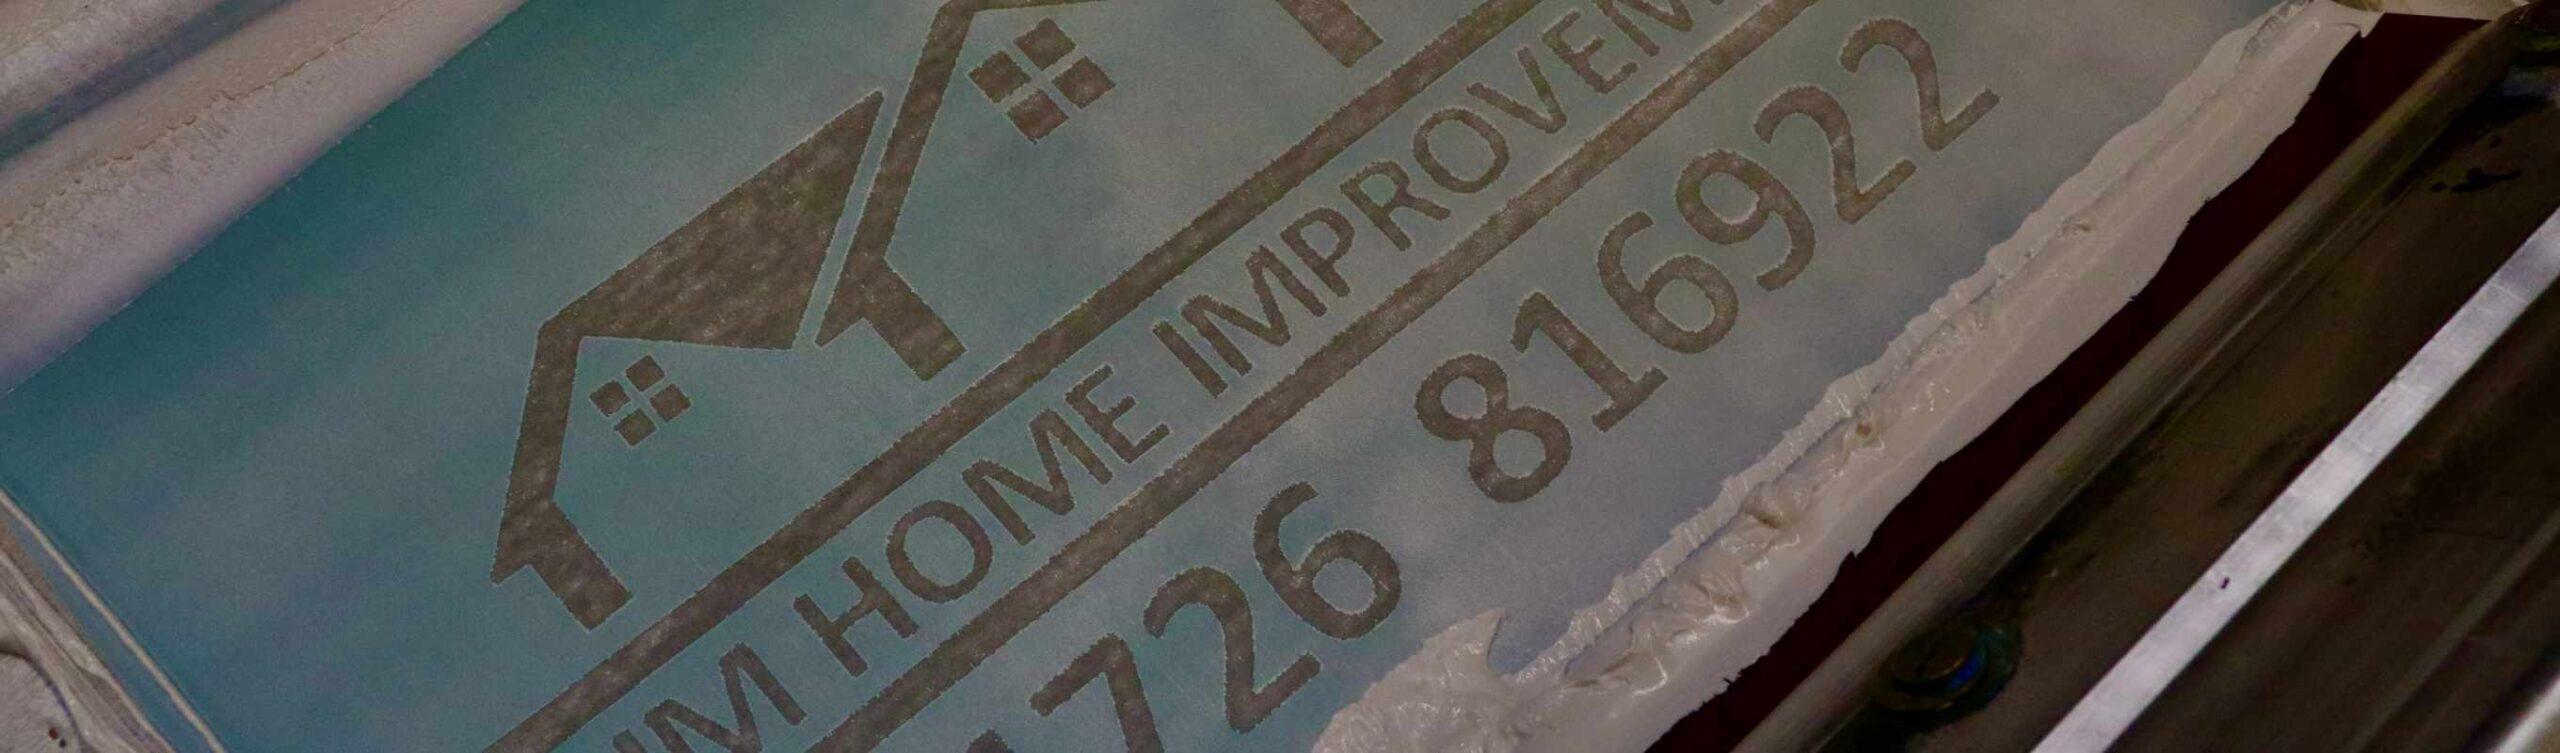 RJM Home Improvements Screenprinting